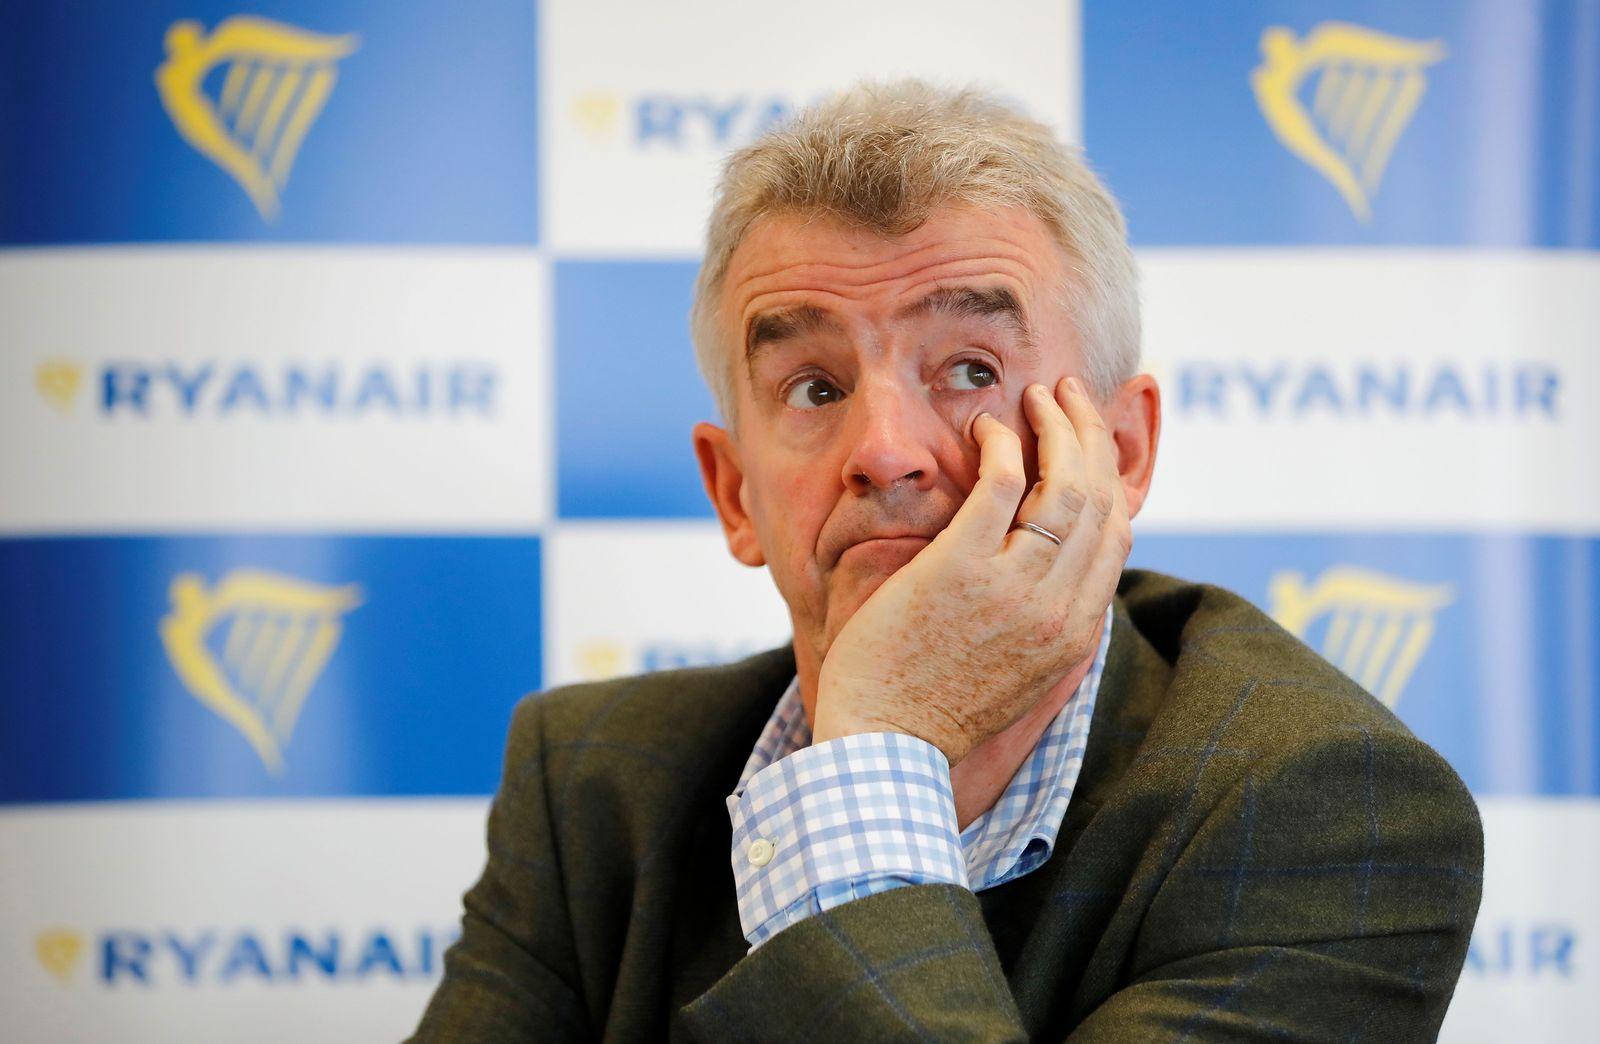 IRELAND-AVIATION-STRIKE-RYANAIR